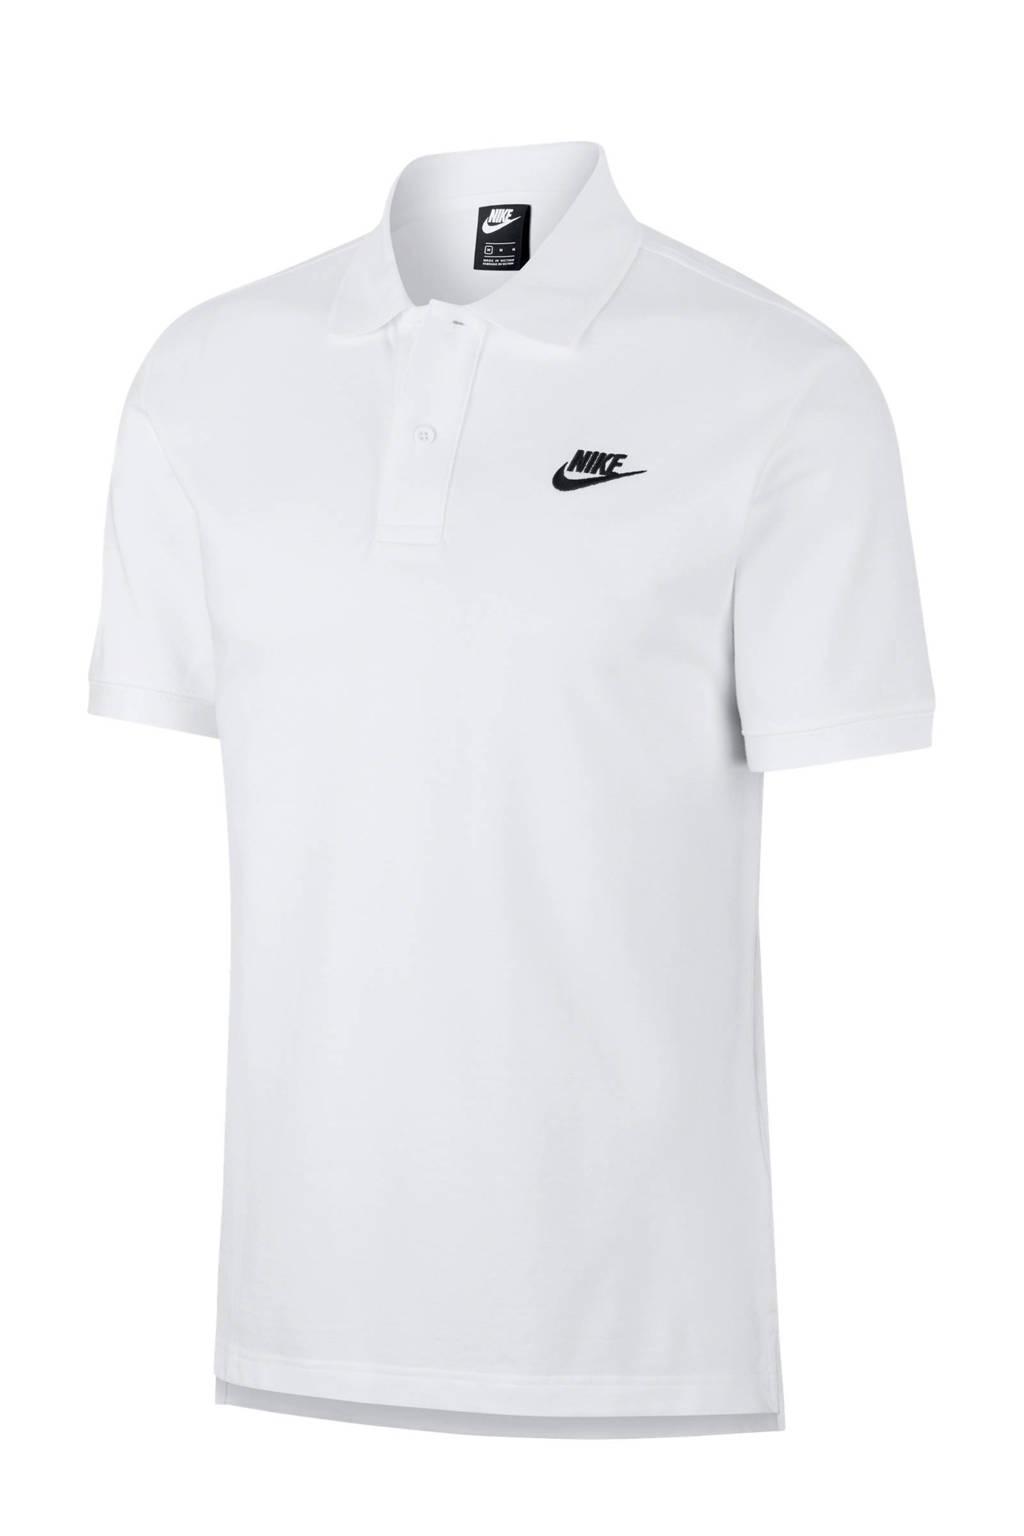 Nike polo wit, Wit